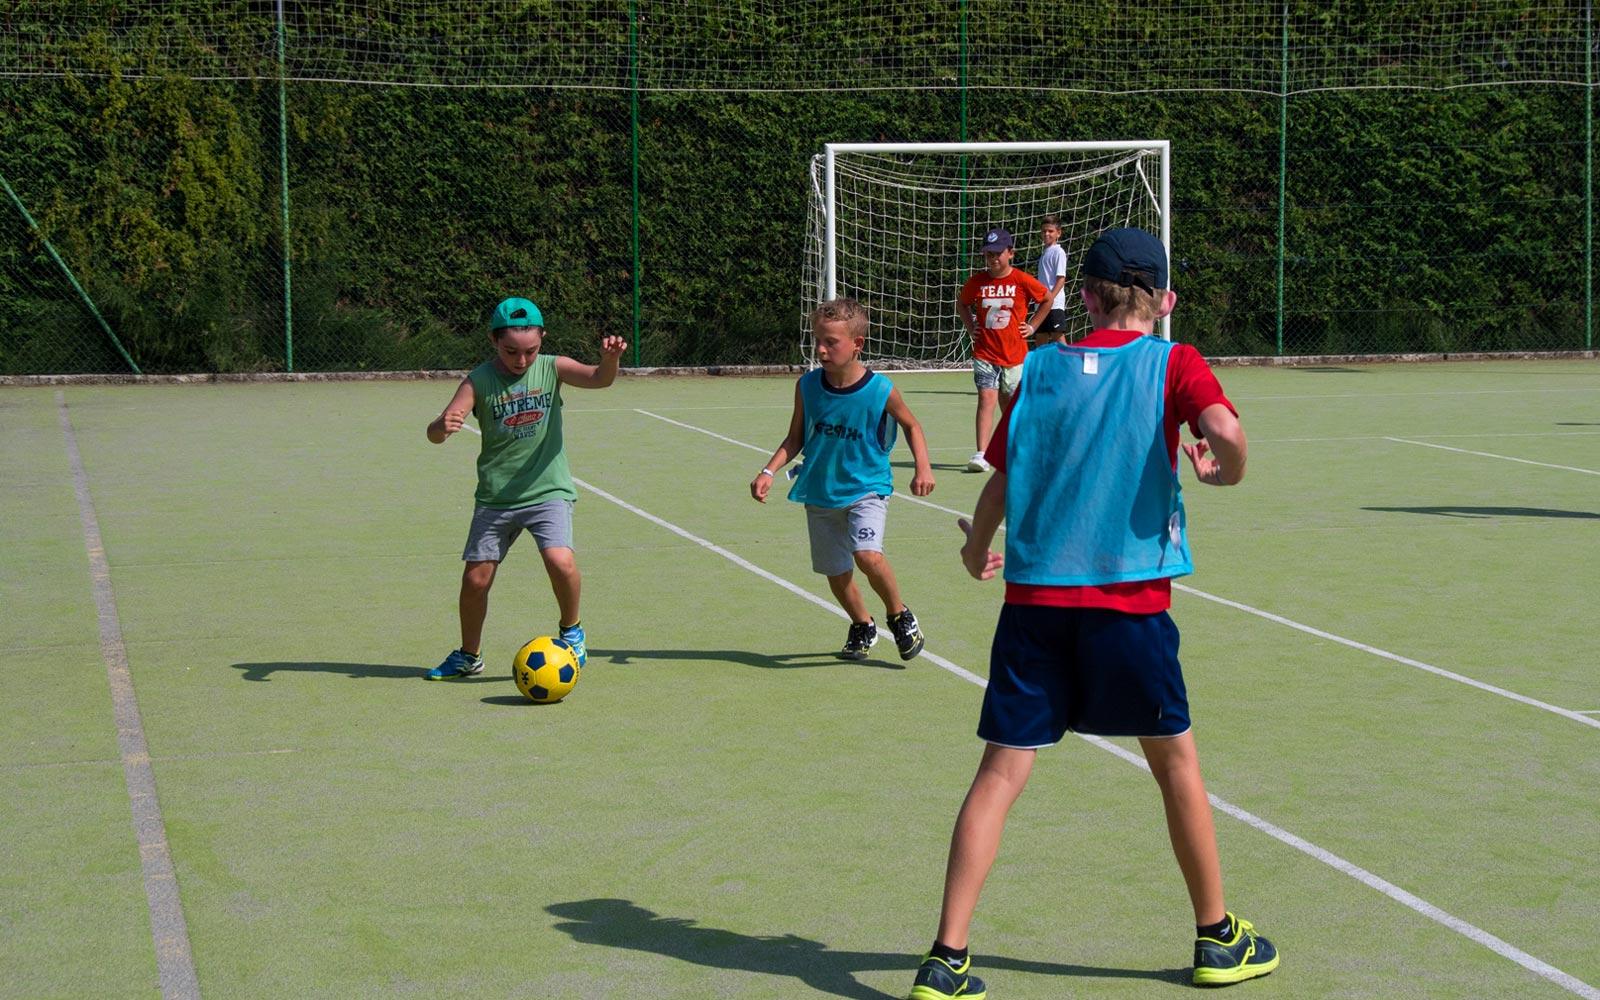 02-Sportaktivitat-fuer-Kinder